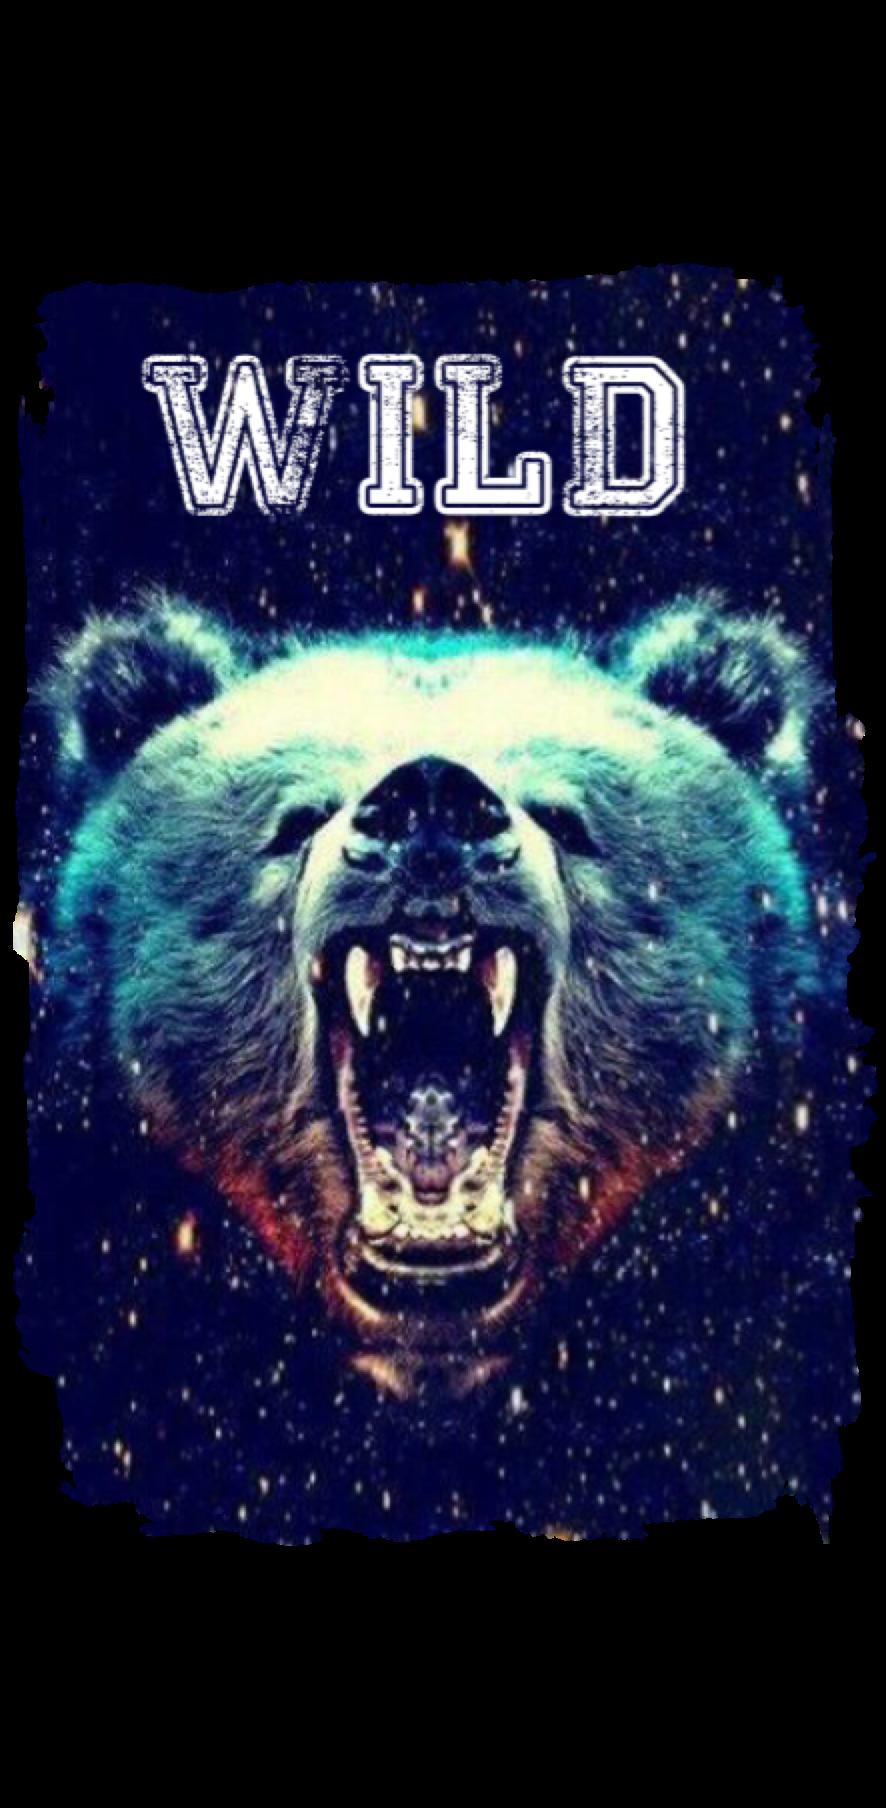 cover BEAR WILD